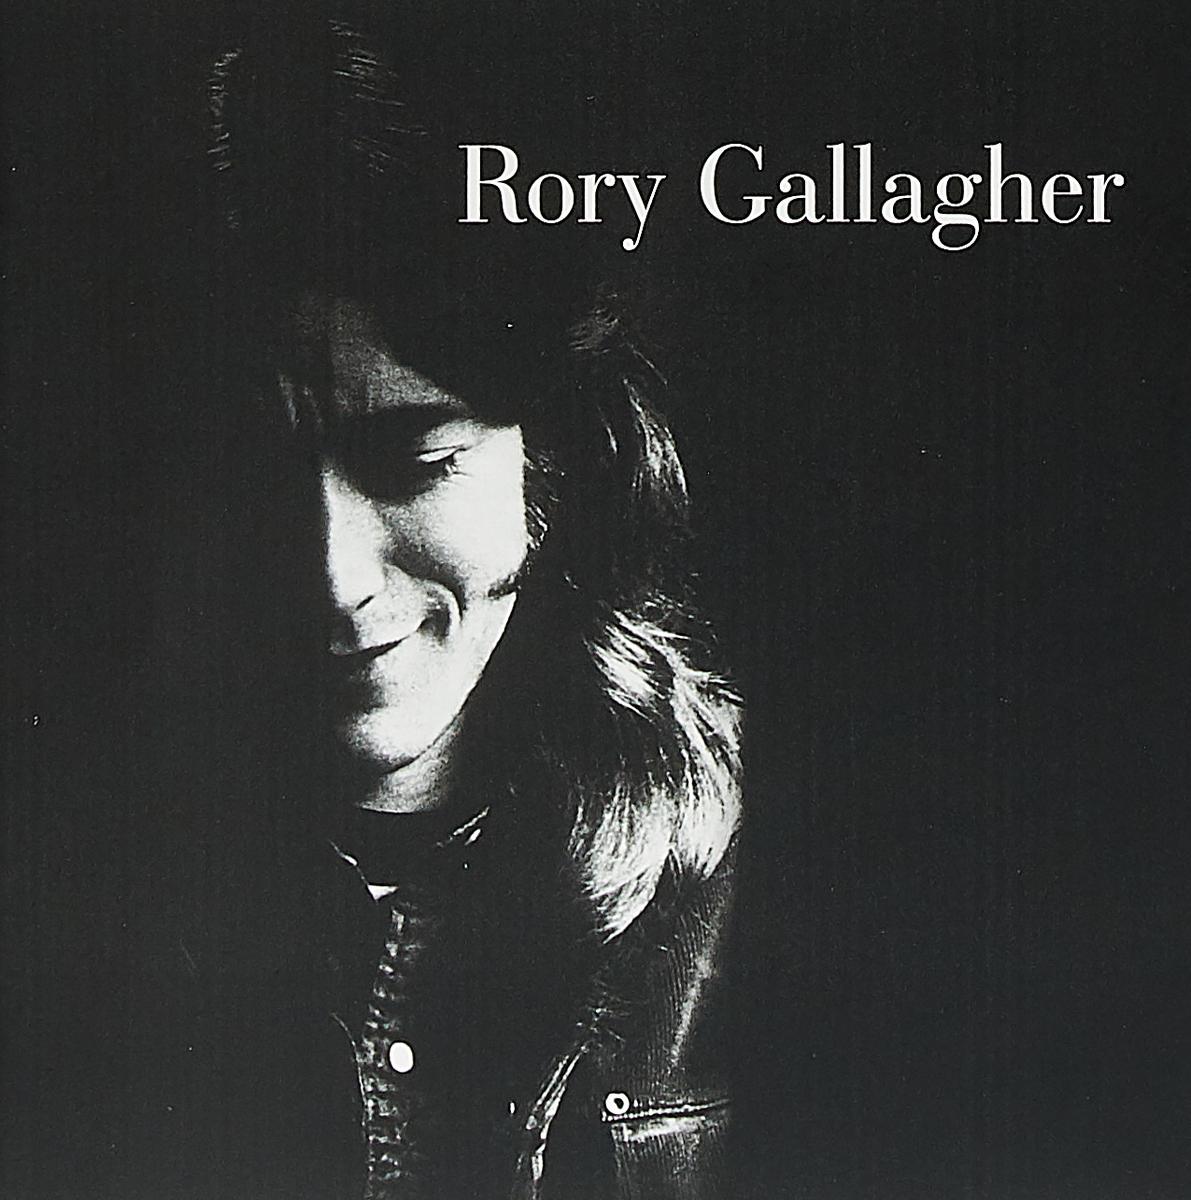 лучшая цена Рори Галлахер Rory Gallagher. Rory Gallagher (CD)